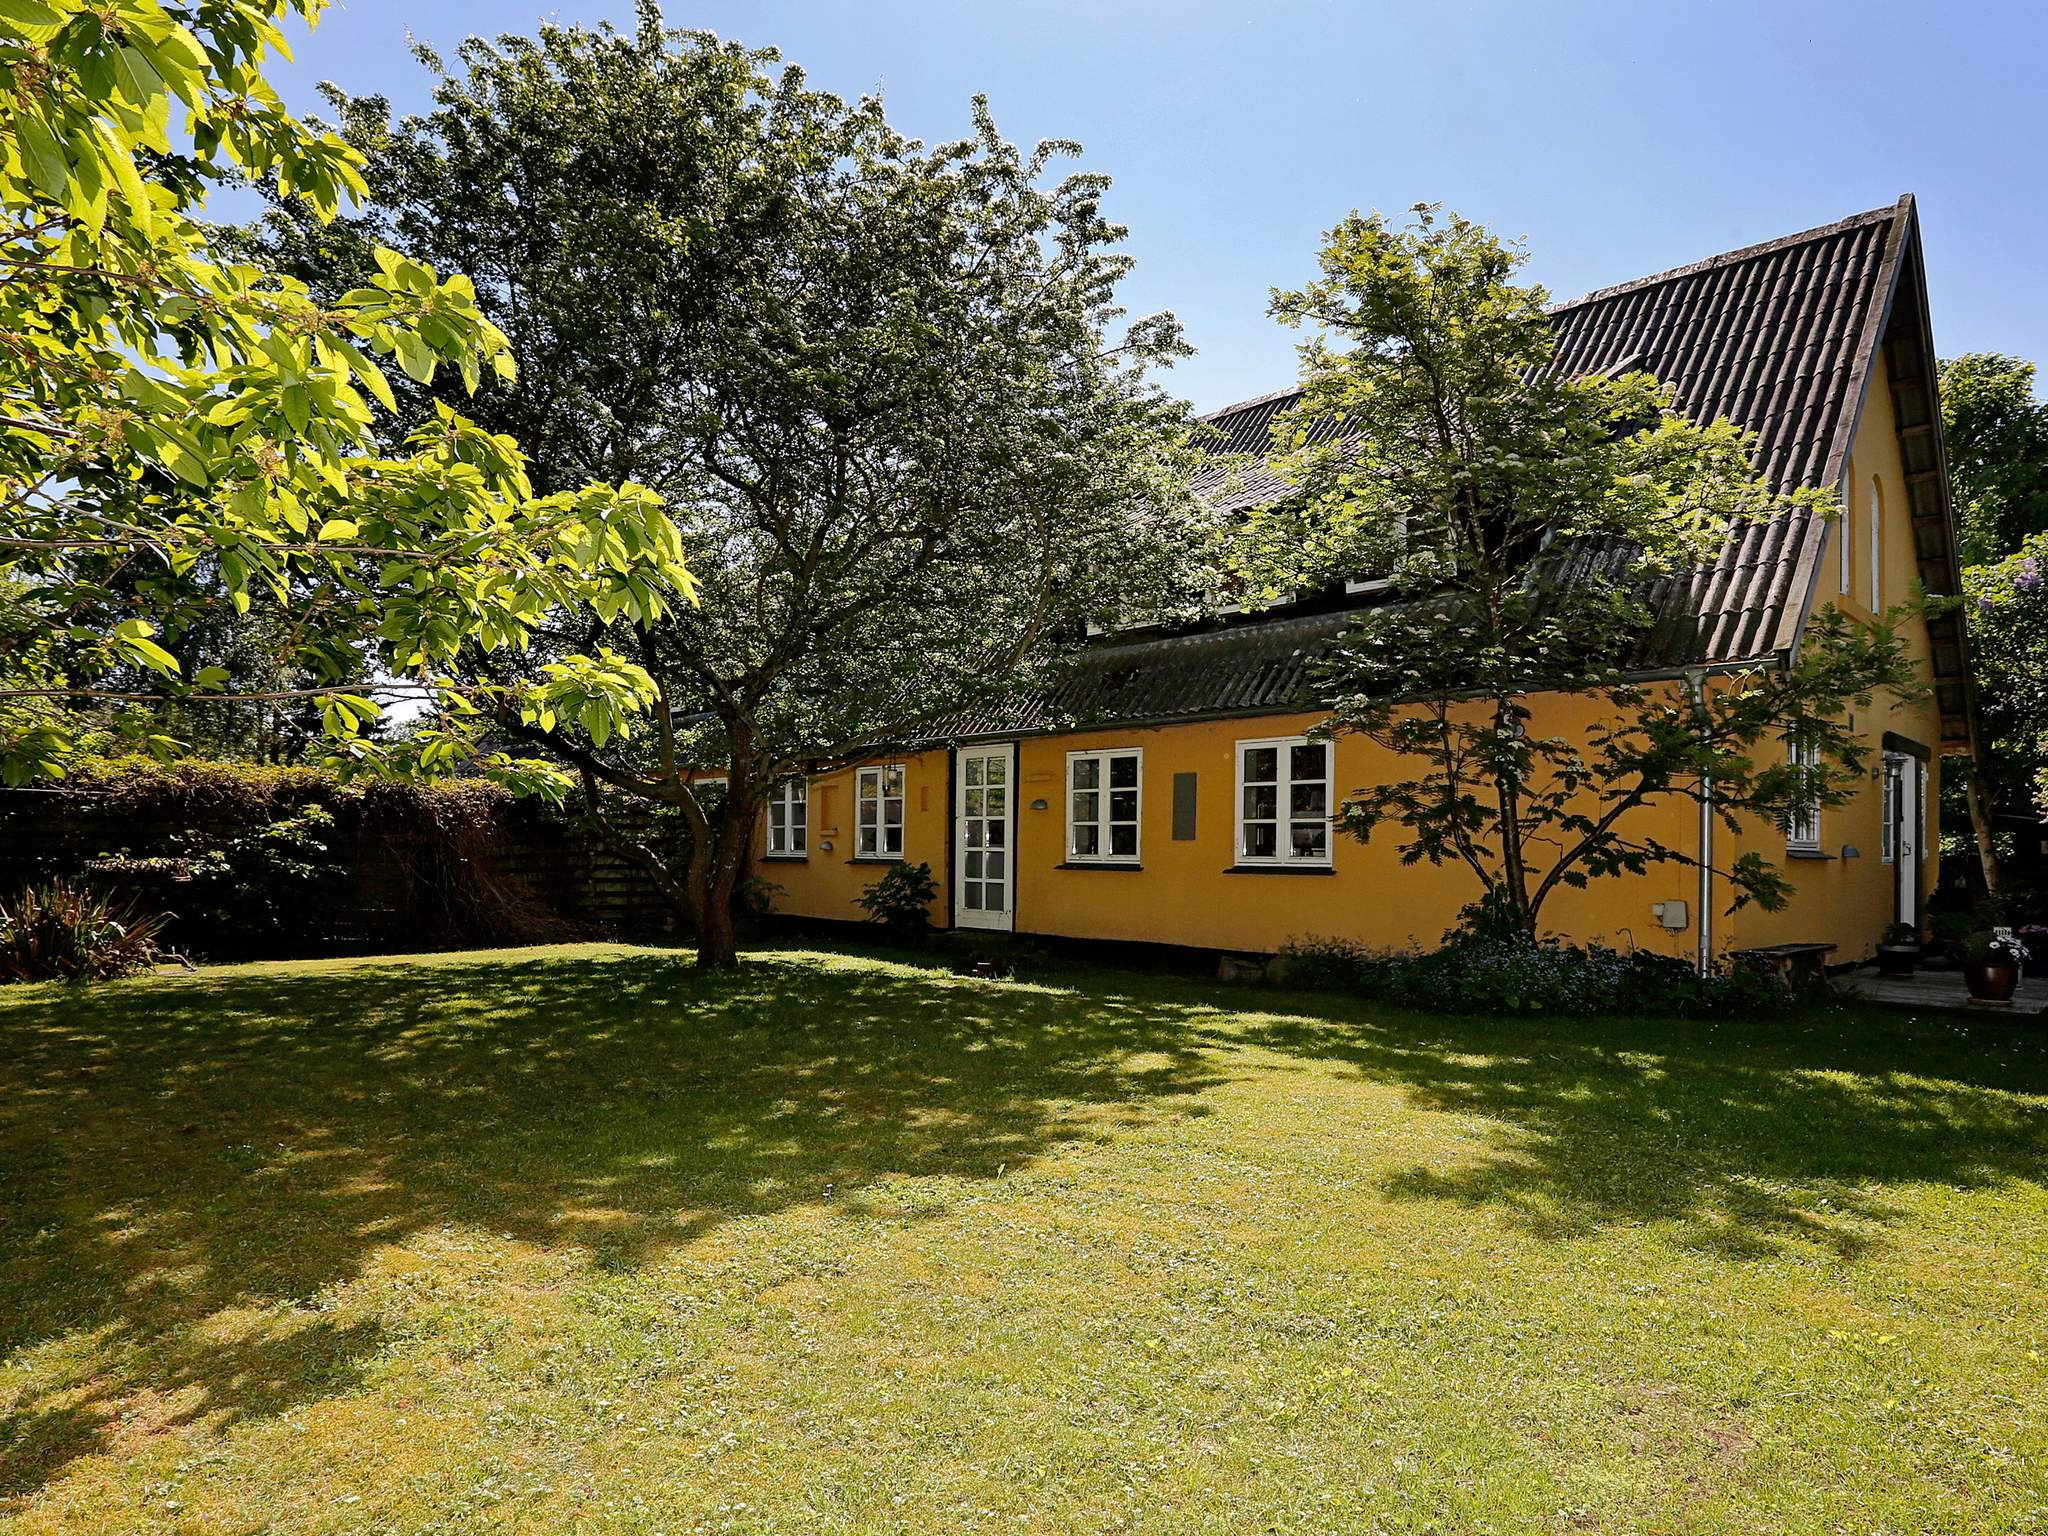 Ferienhaus Vejby Strand (771891), Vejby, , Nordseeland, Dänemark, Bild 31